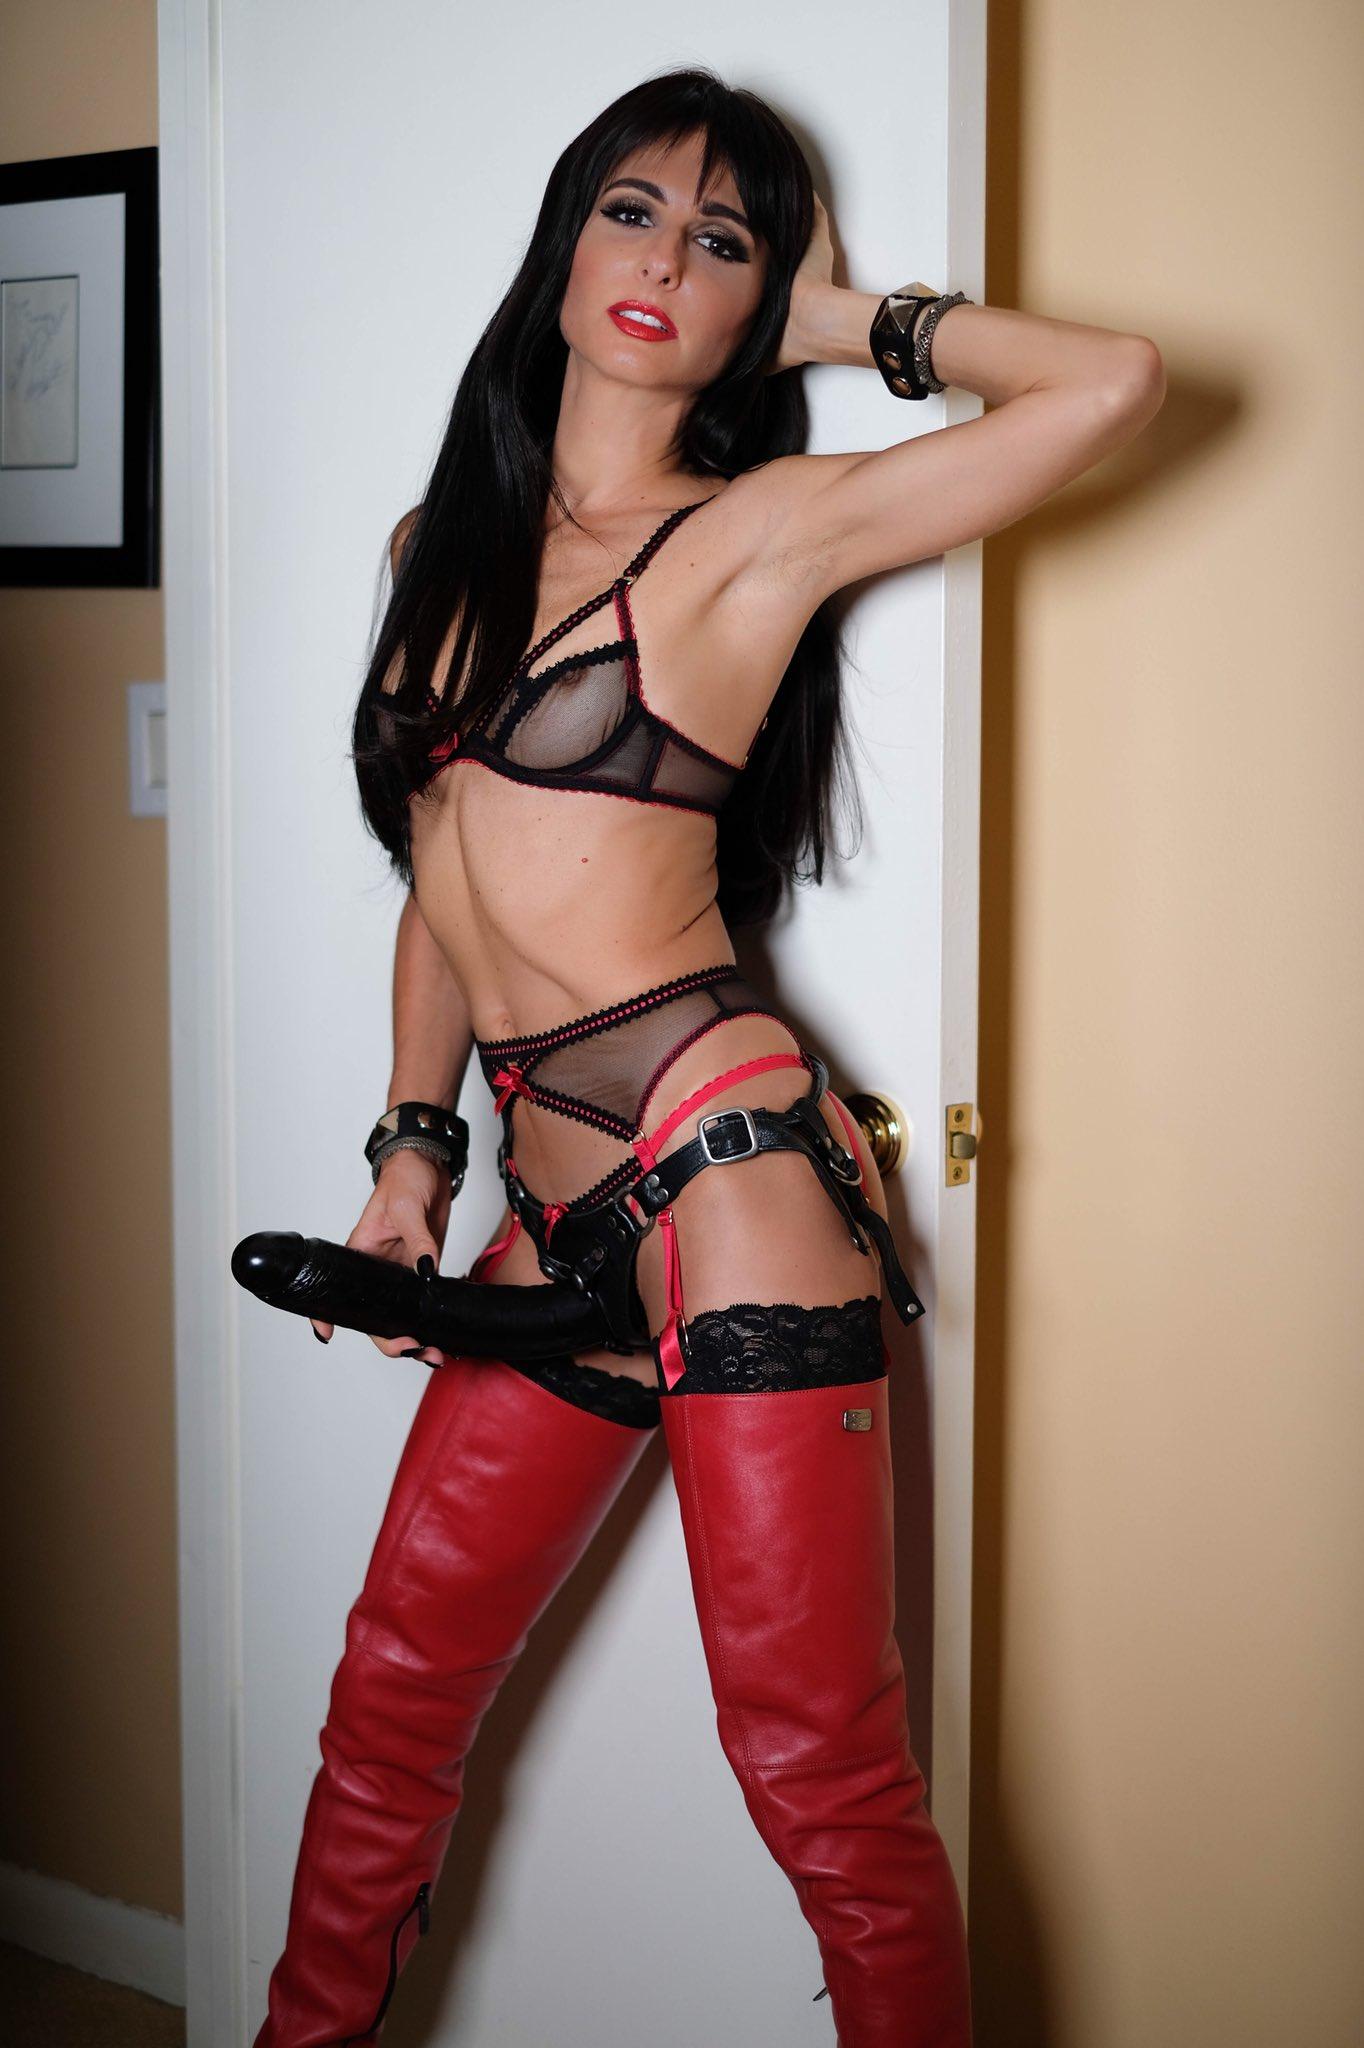 Dominent mistress